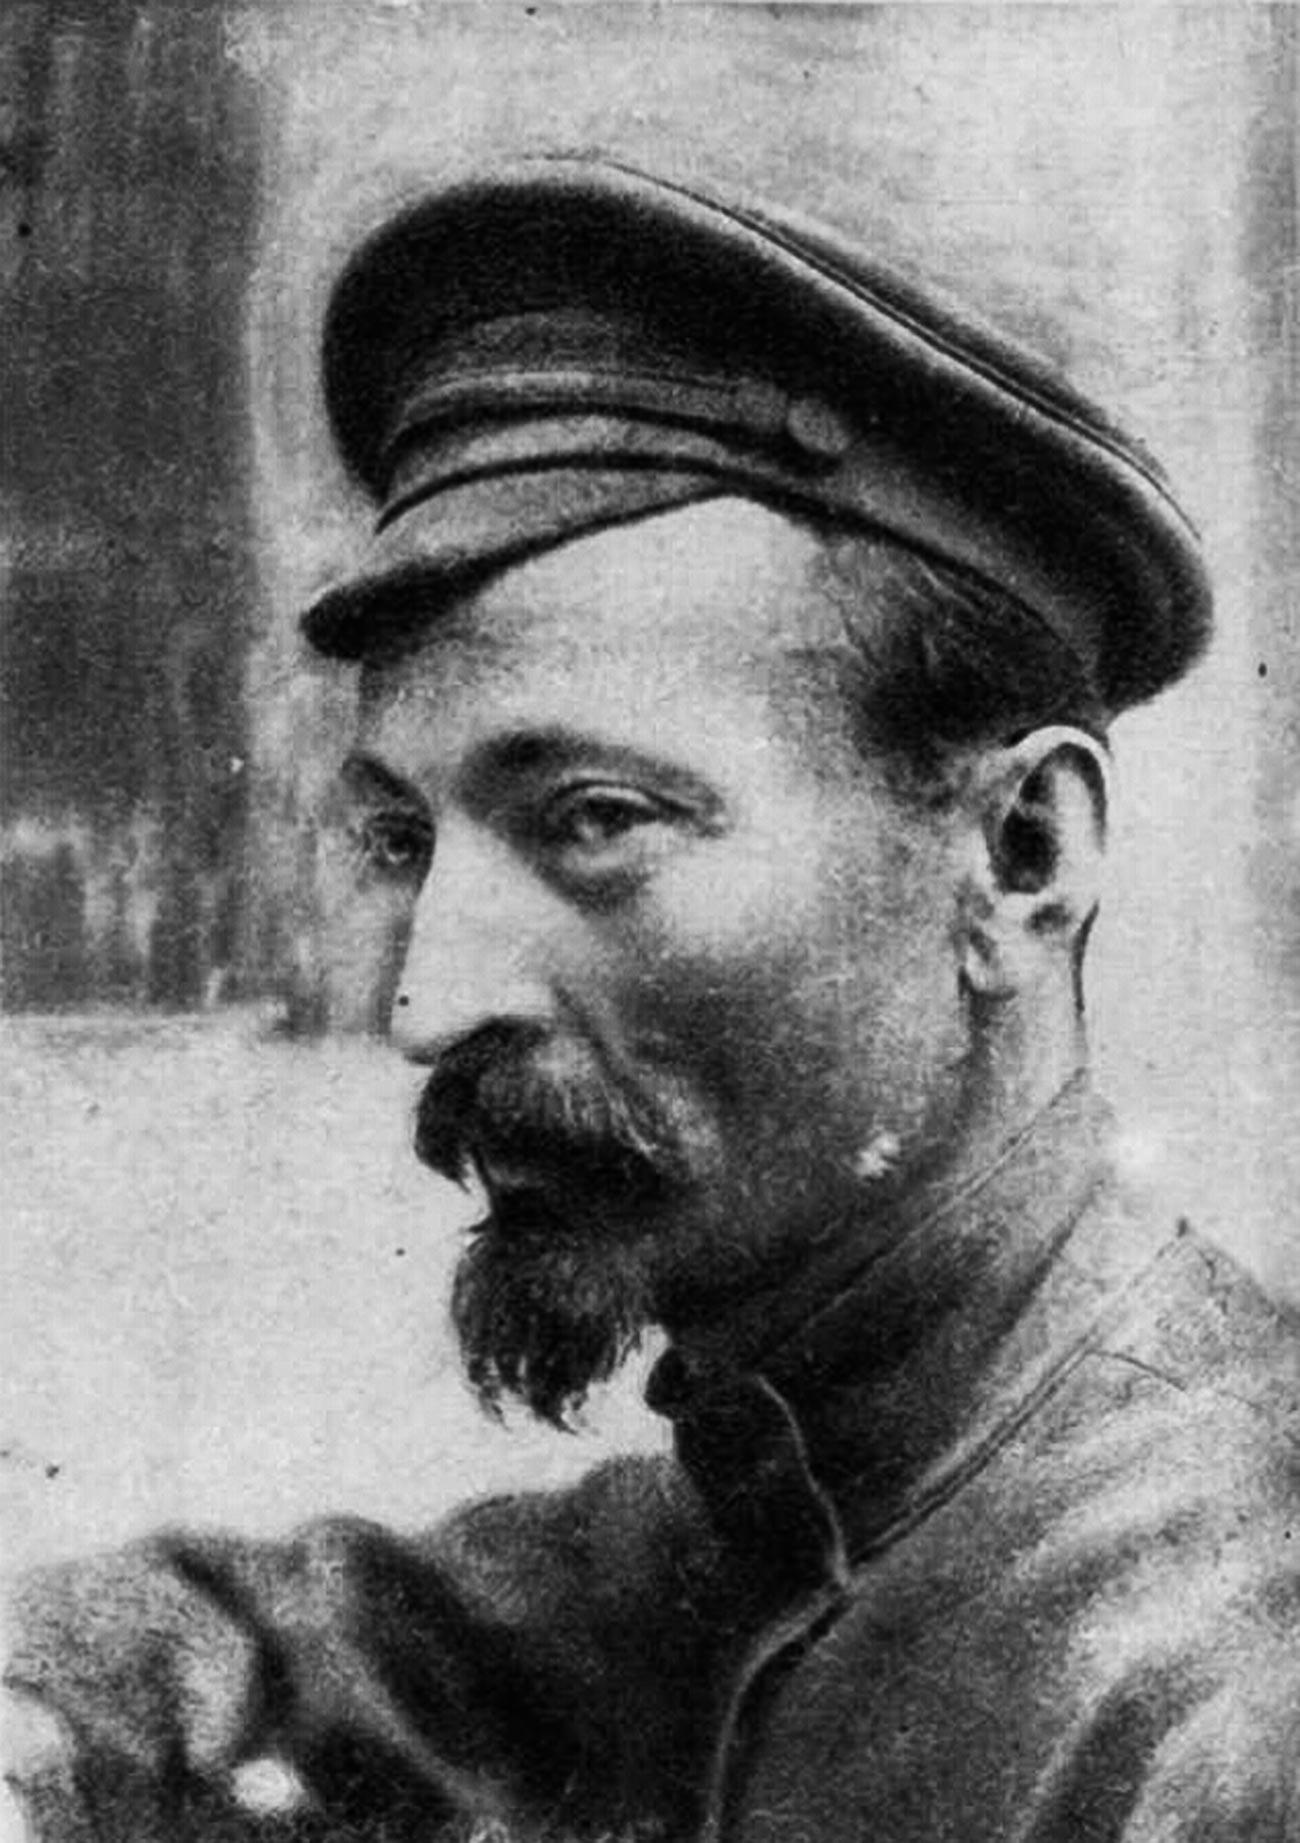 The main chekist, Felix Dzerzhinsky, 1921